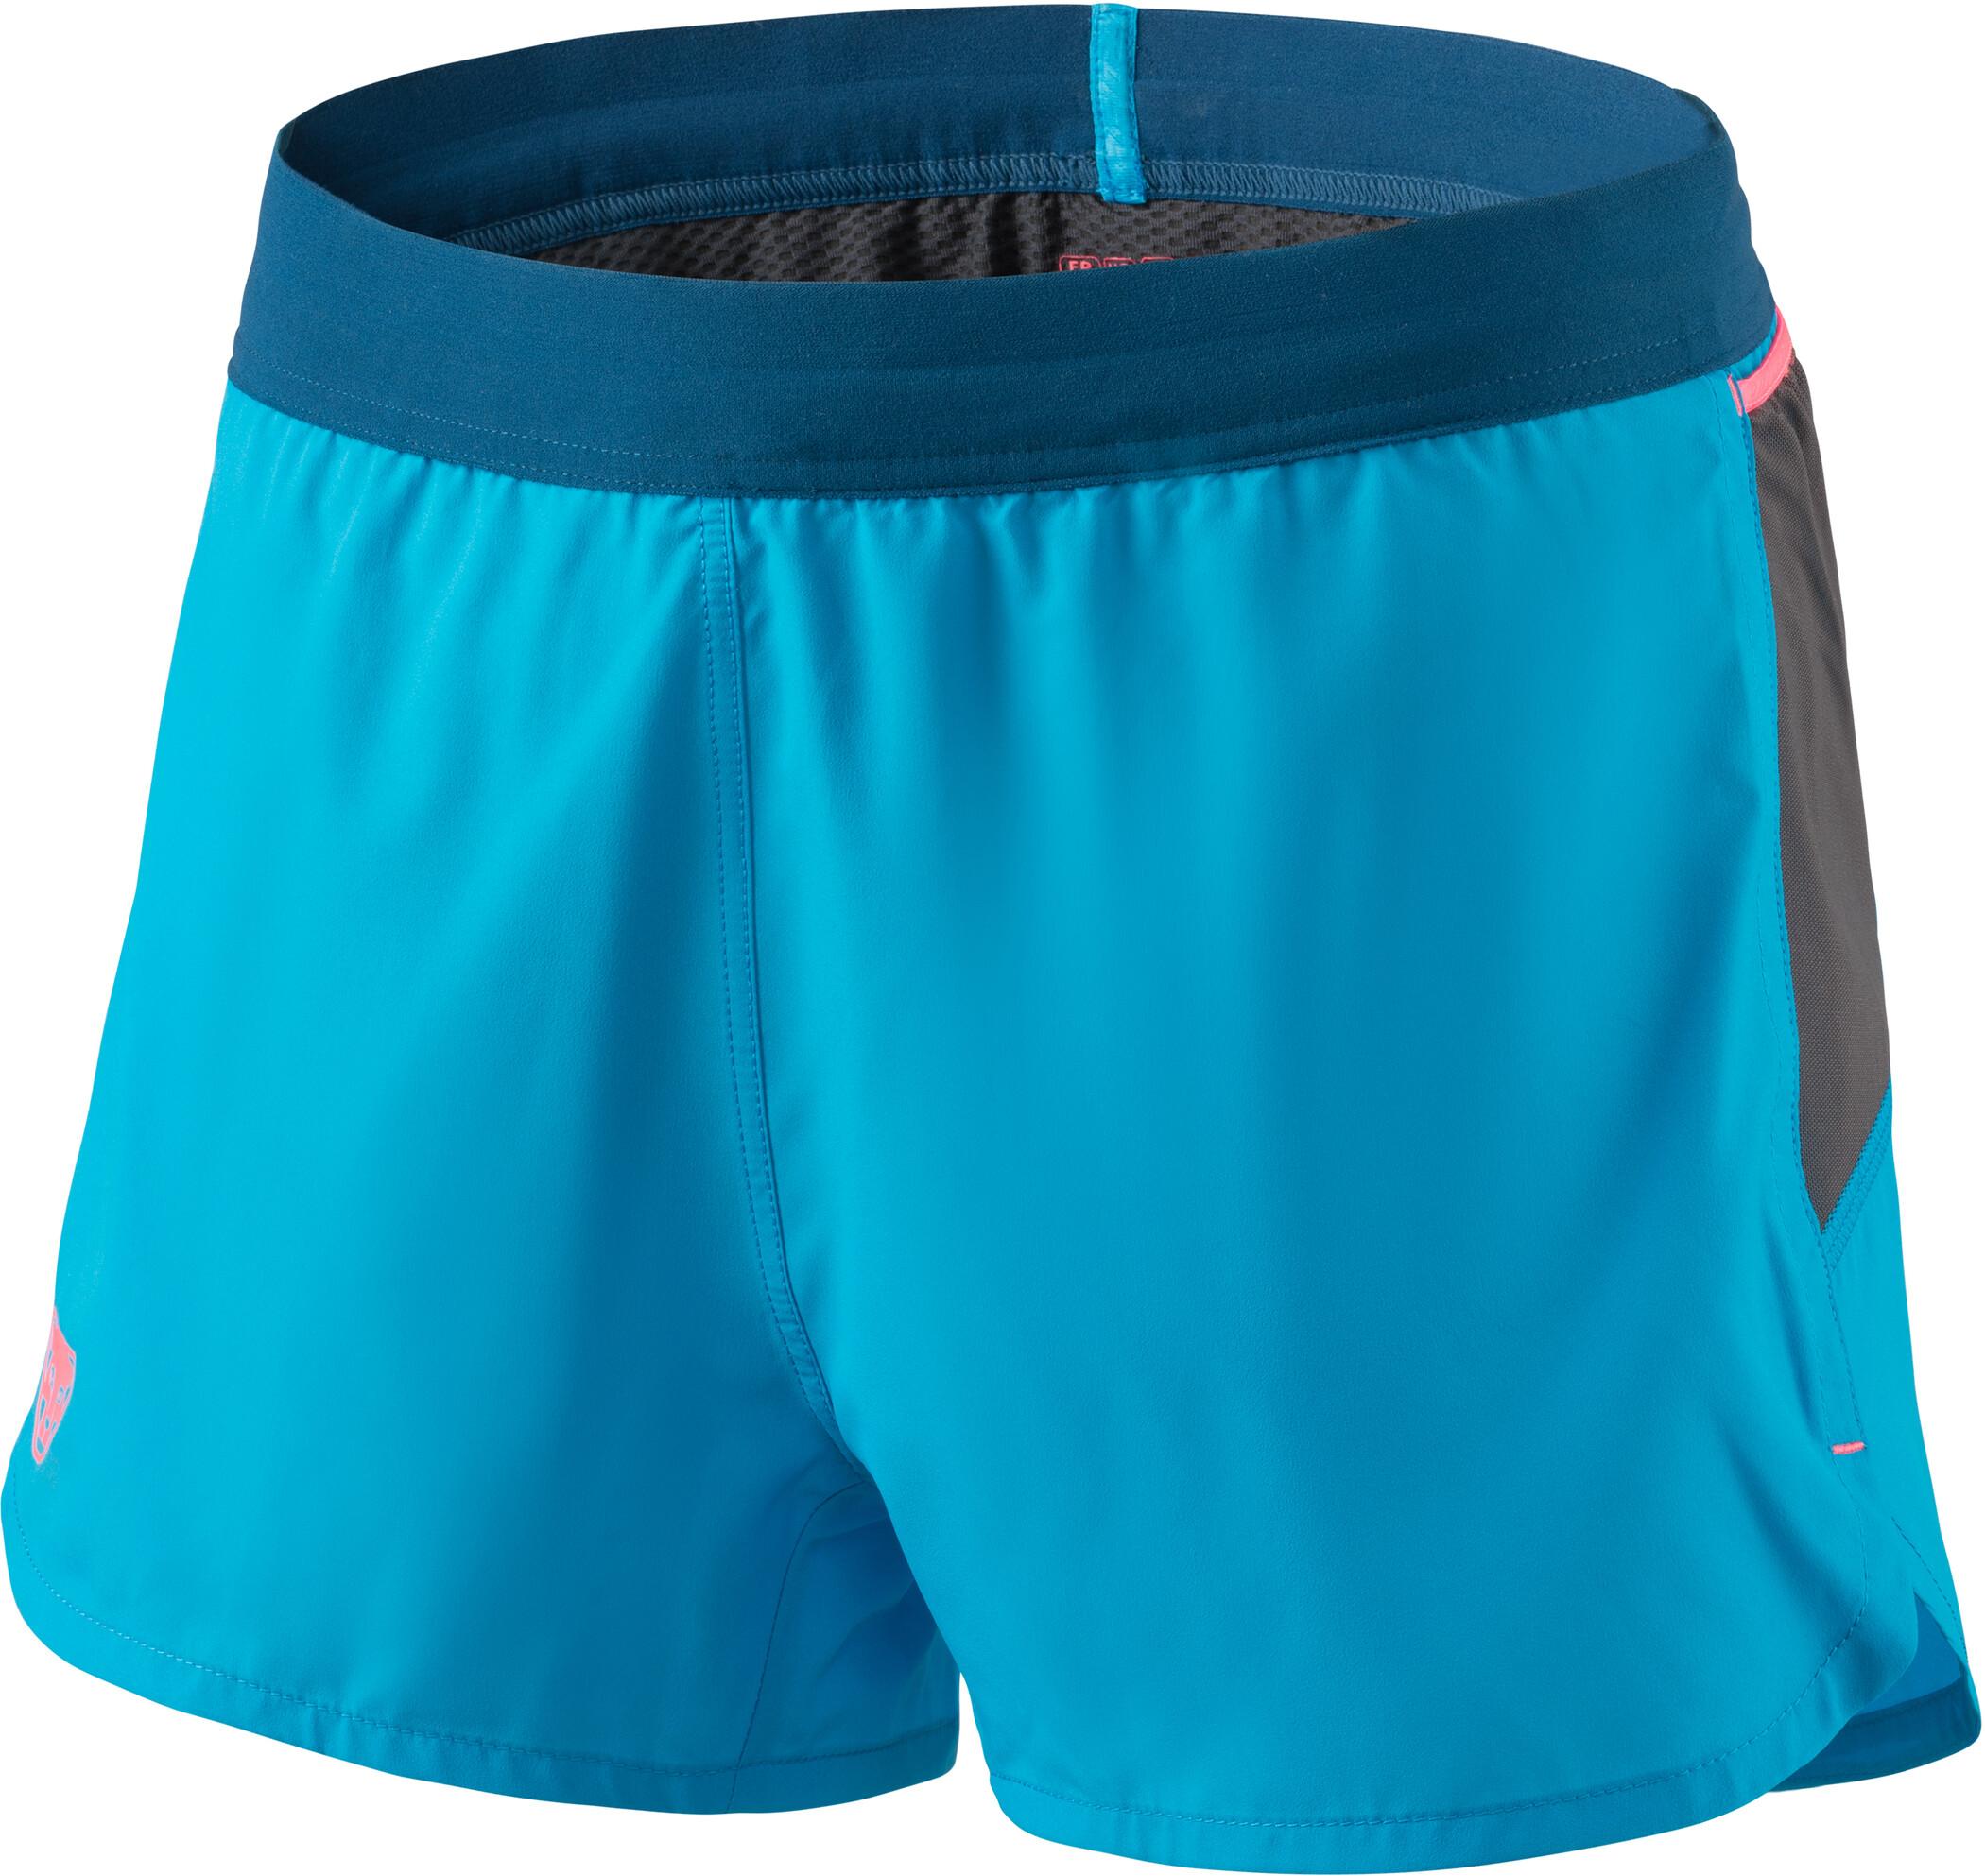 Dynafit Vert Shorts Damer, methyl blue | Bukser